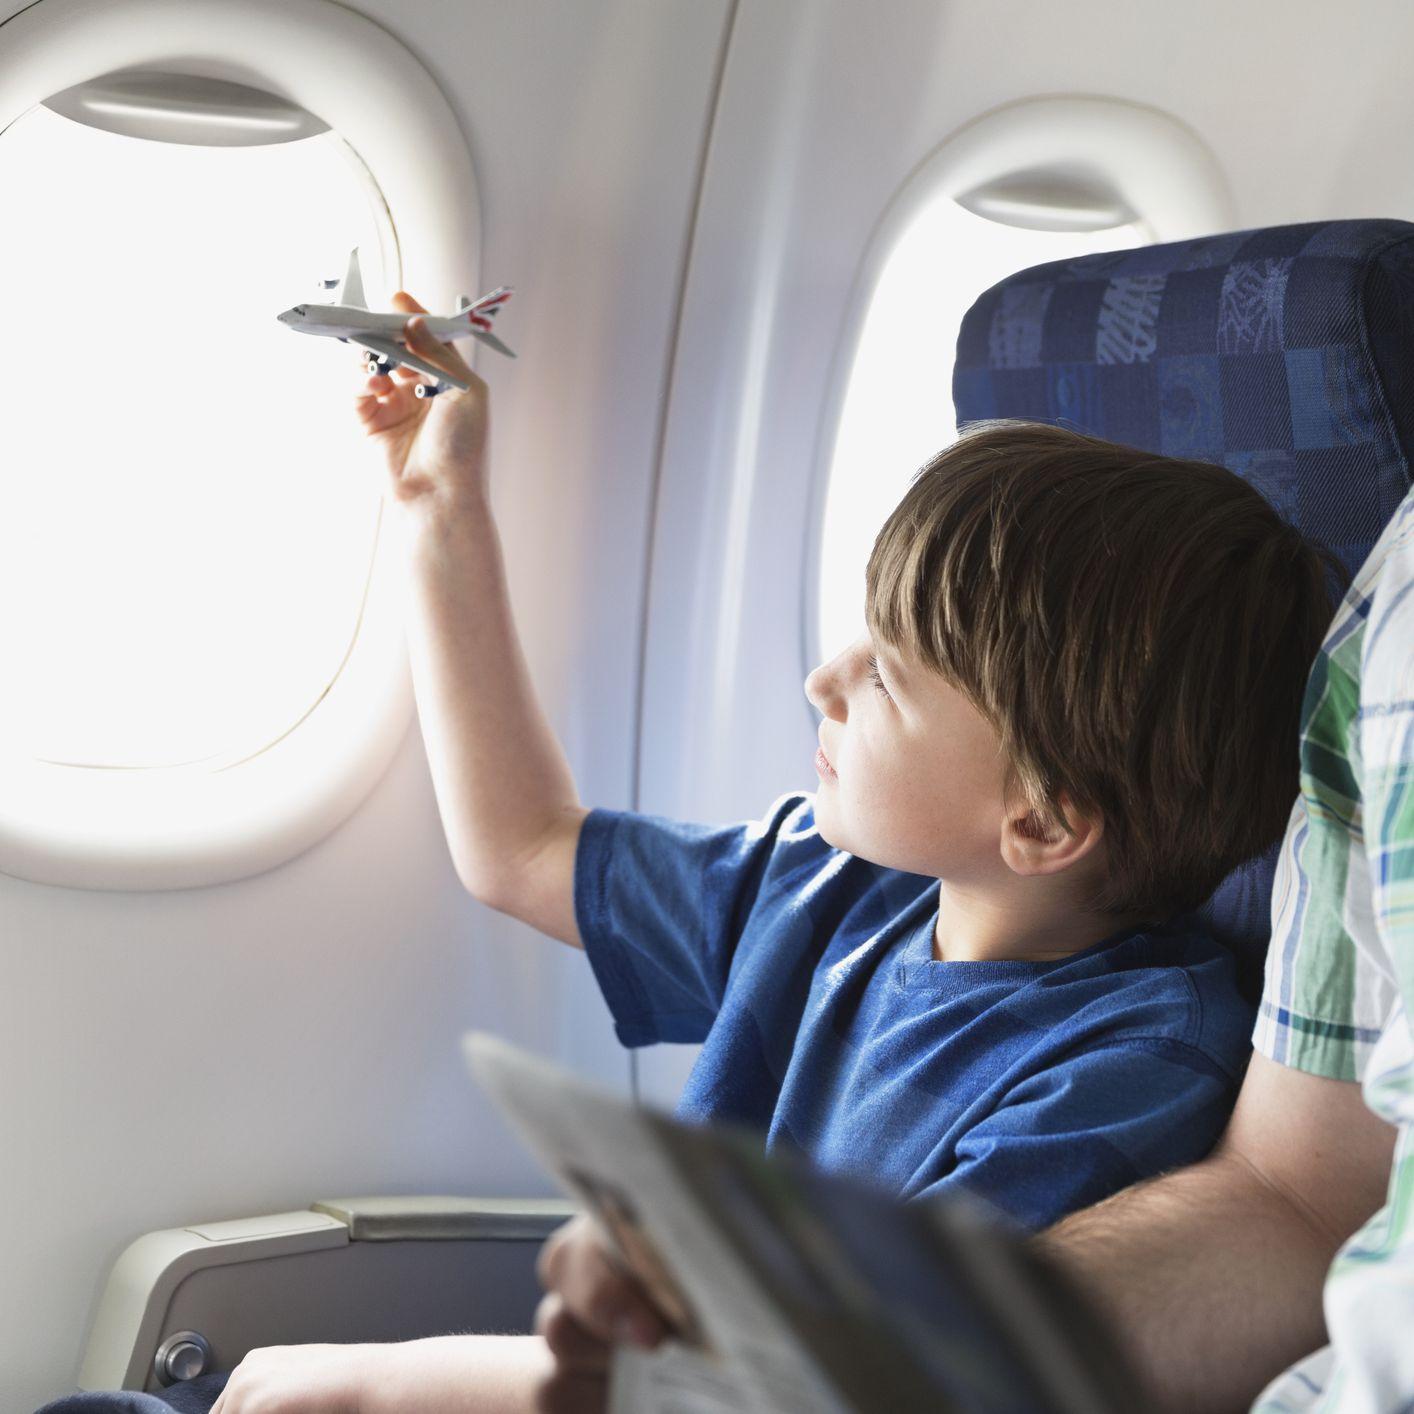 edb45cc8858 Does My Child Need ID to Fly